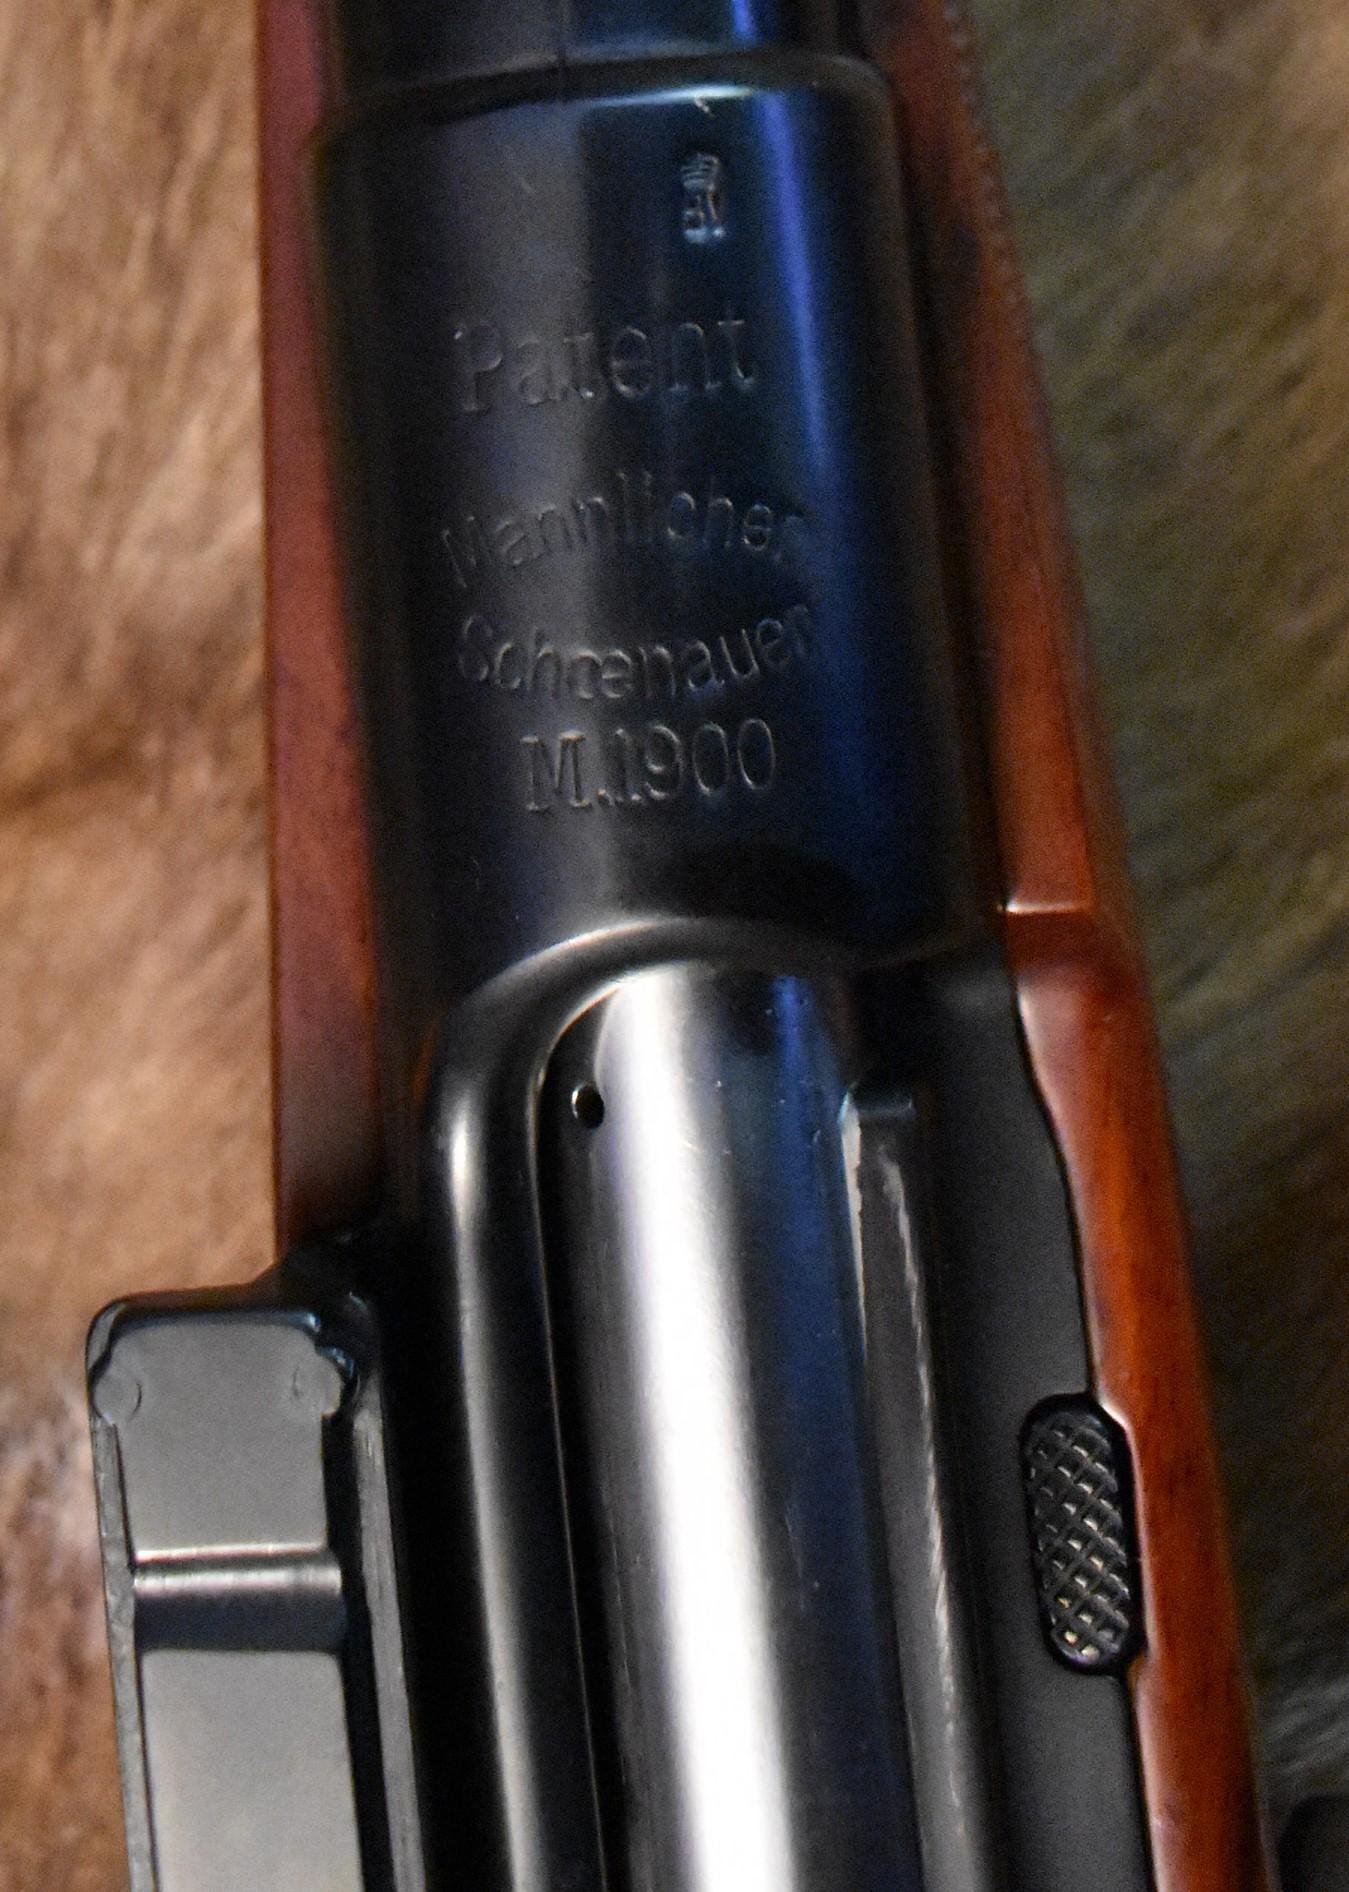 MS M1900.jpg